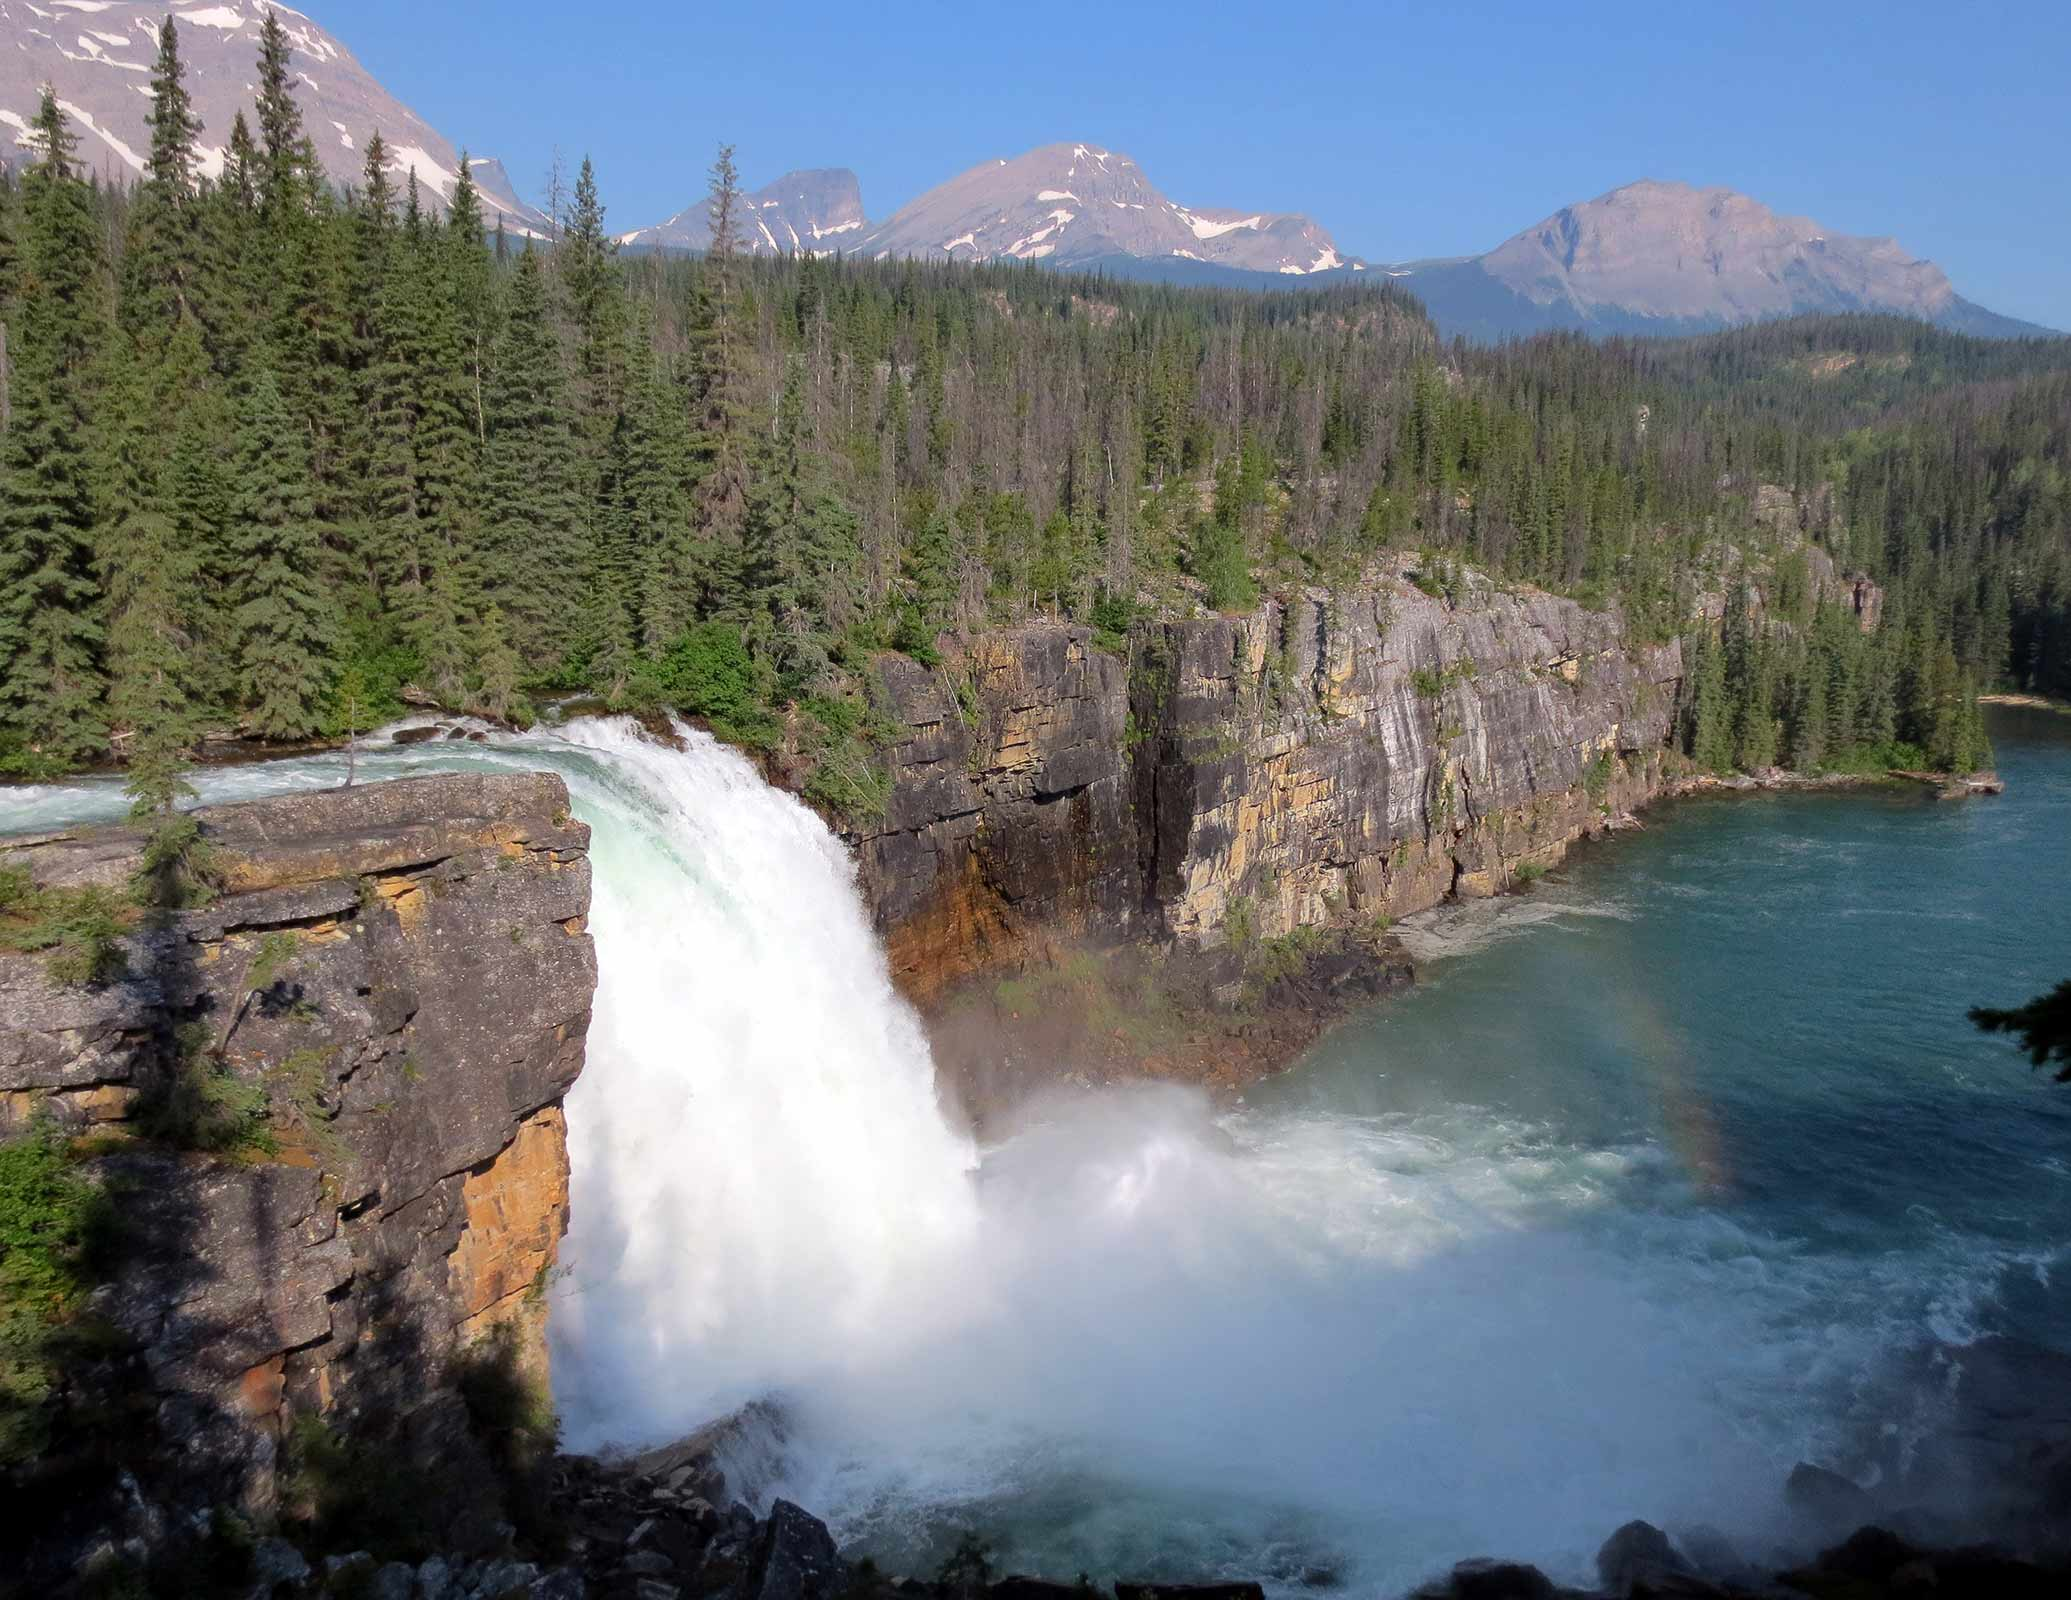 Cascades Brooks Falls